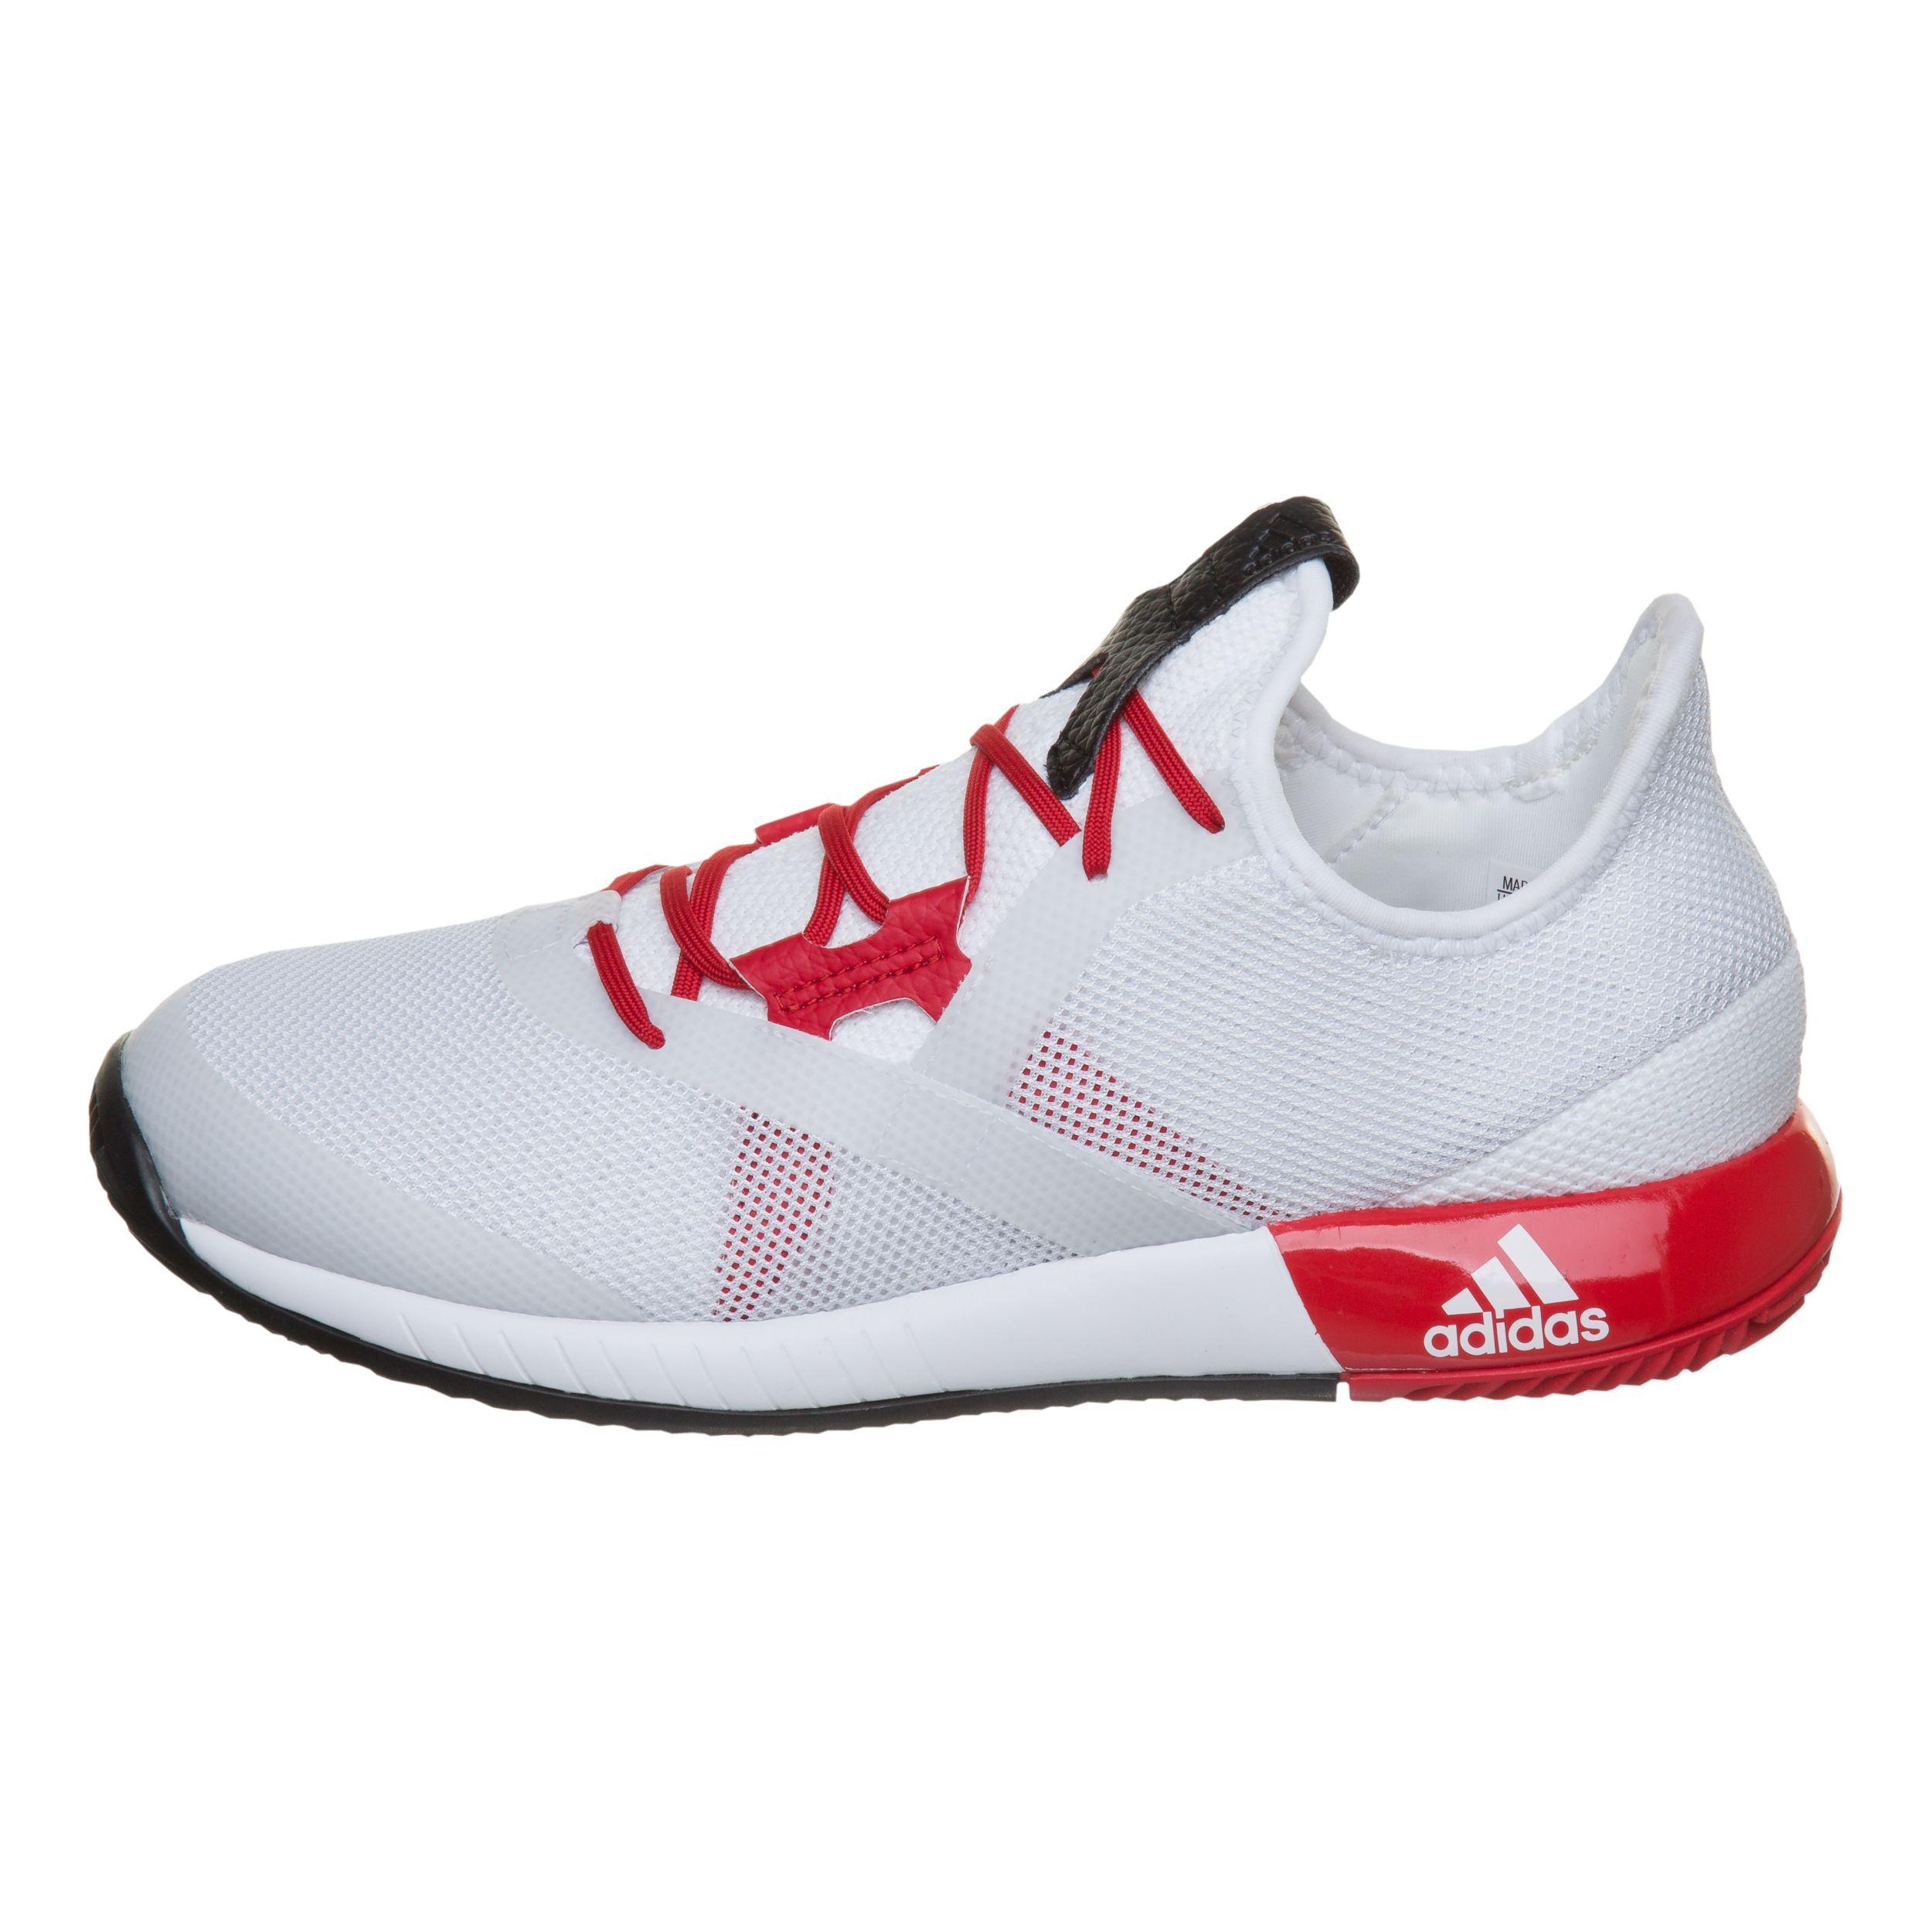 adidas Adizero Defiant Bounce Chaussure Tout Terrain Femmes